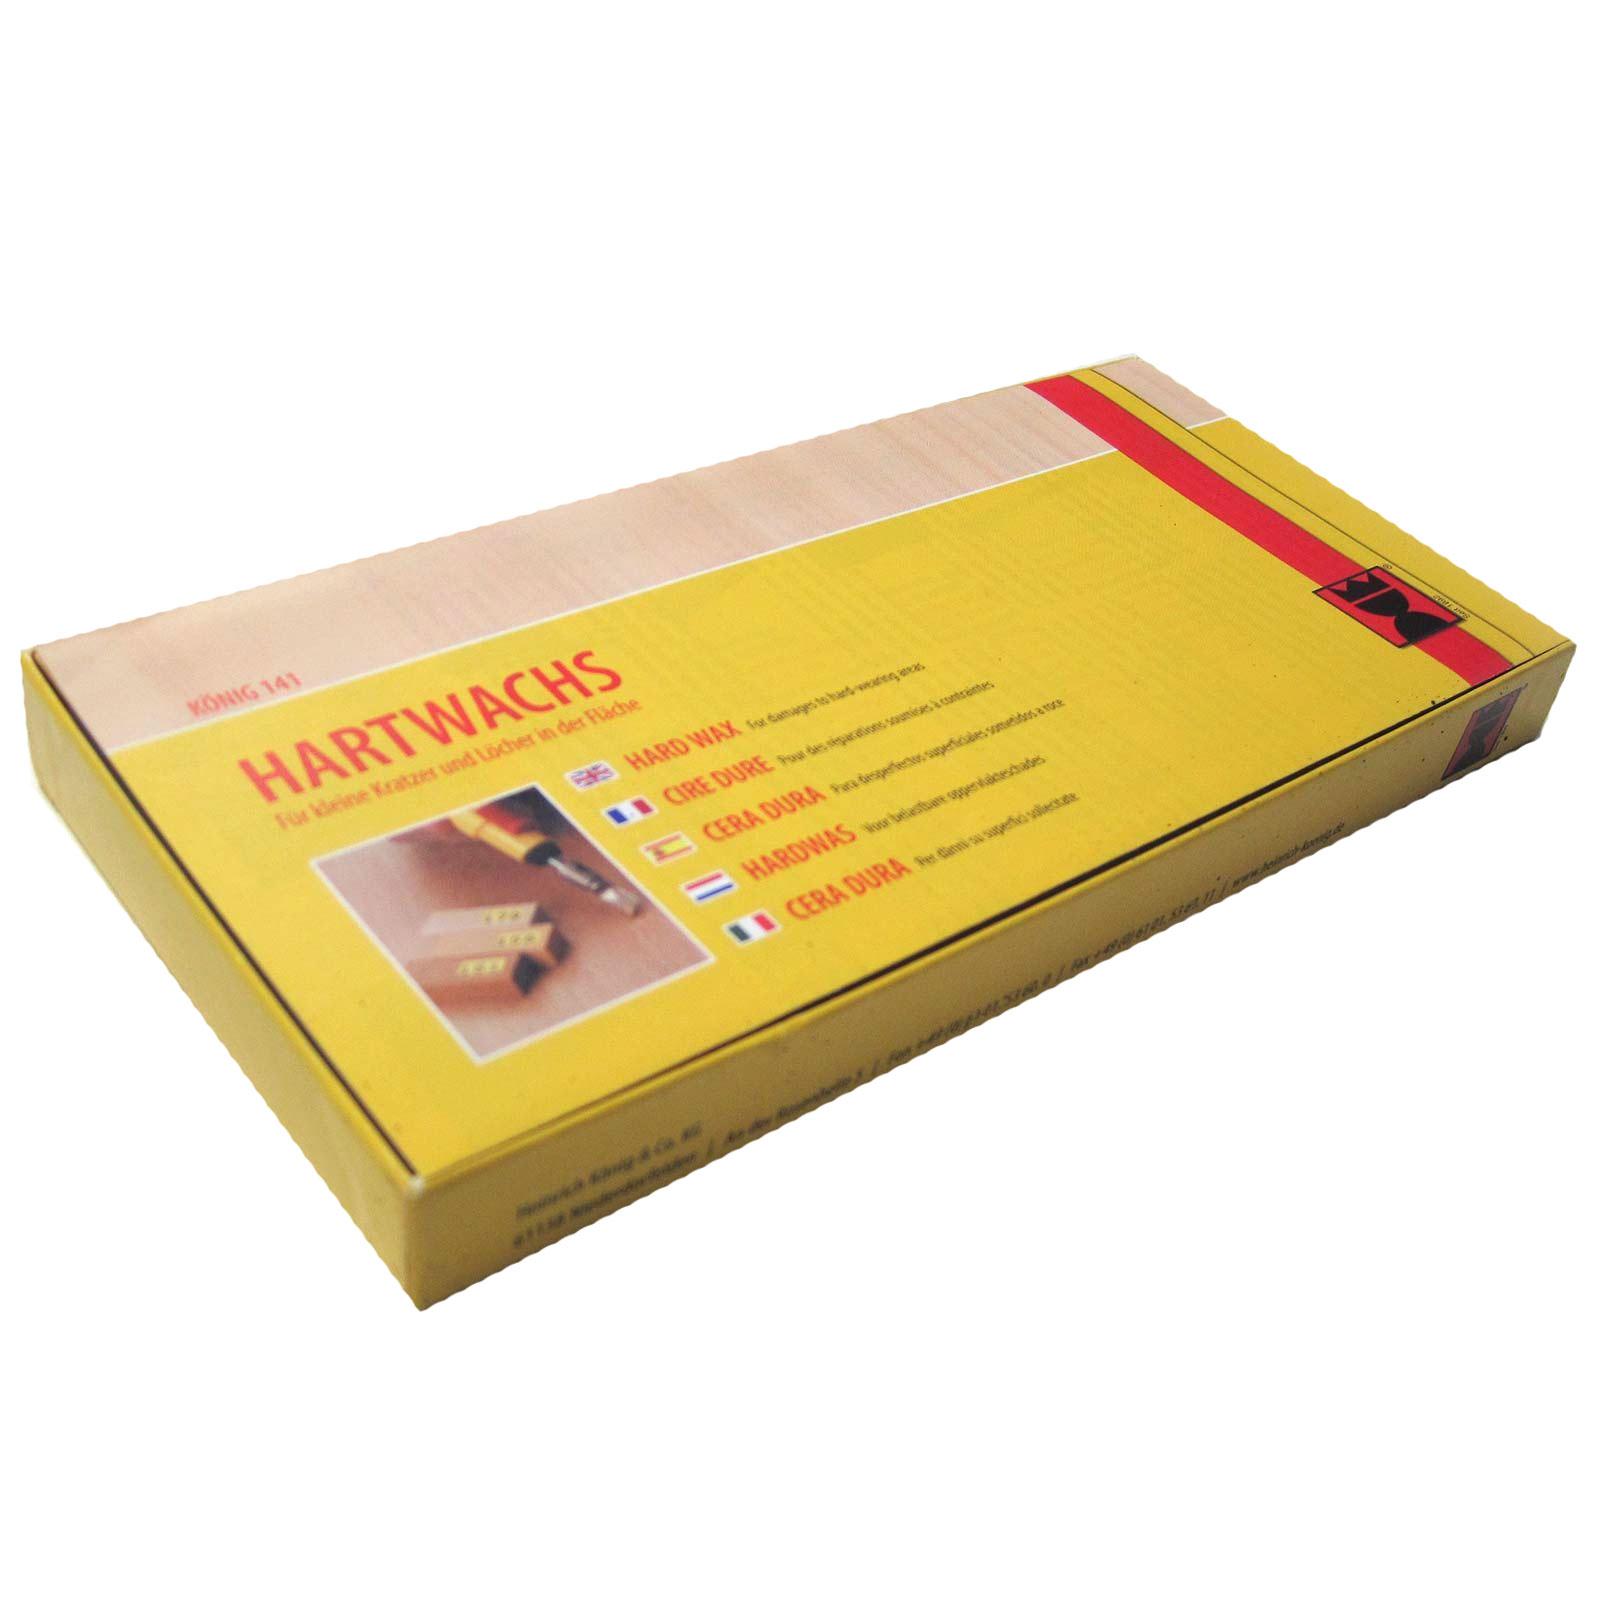 Konig Hard Wax 10 Pack Black Brown 2984 Truly Pvc